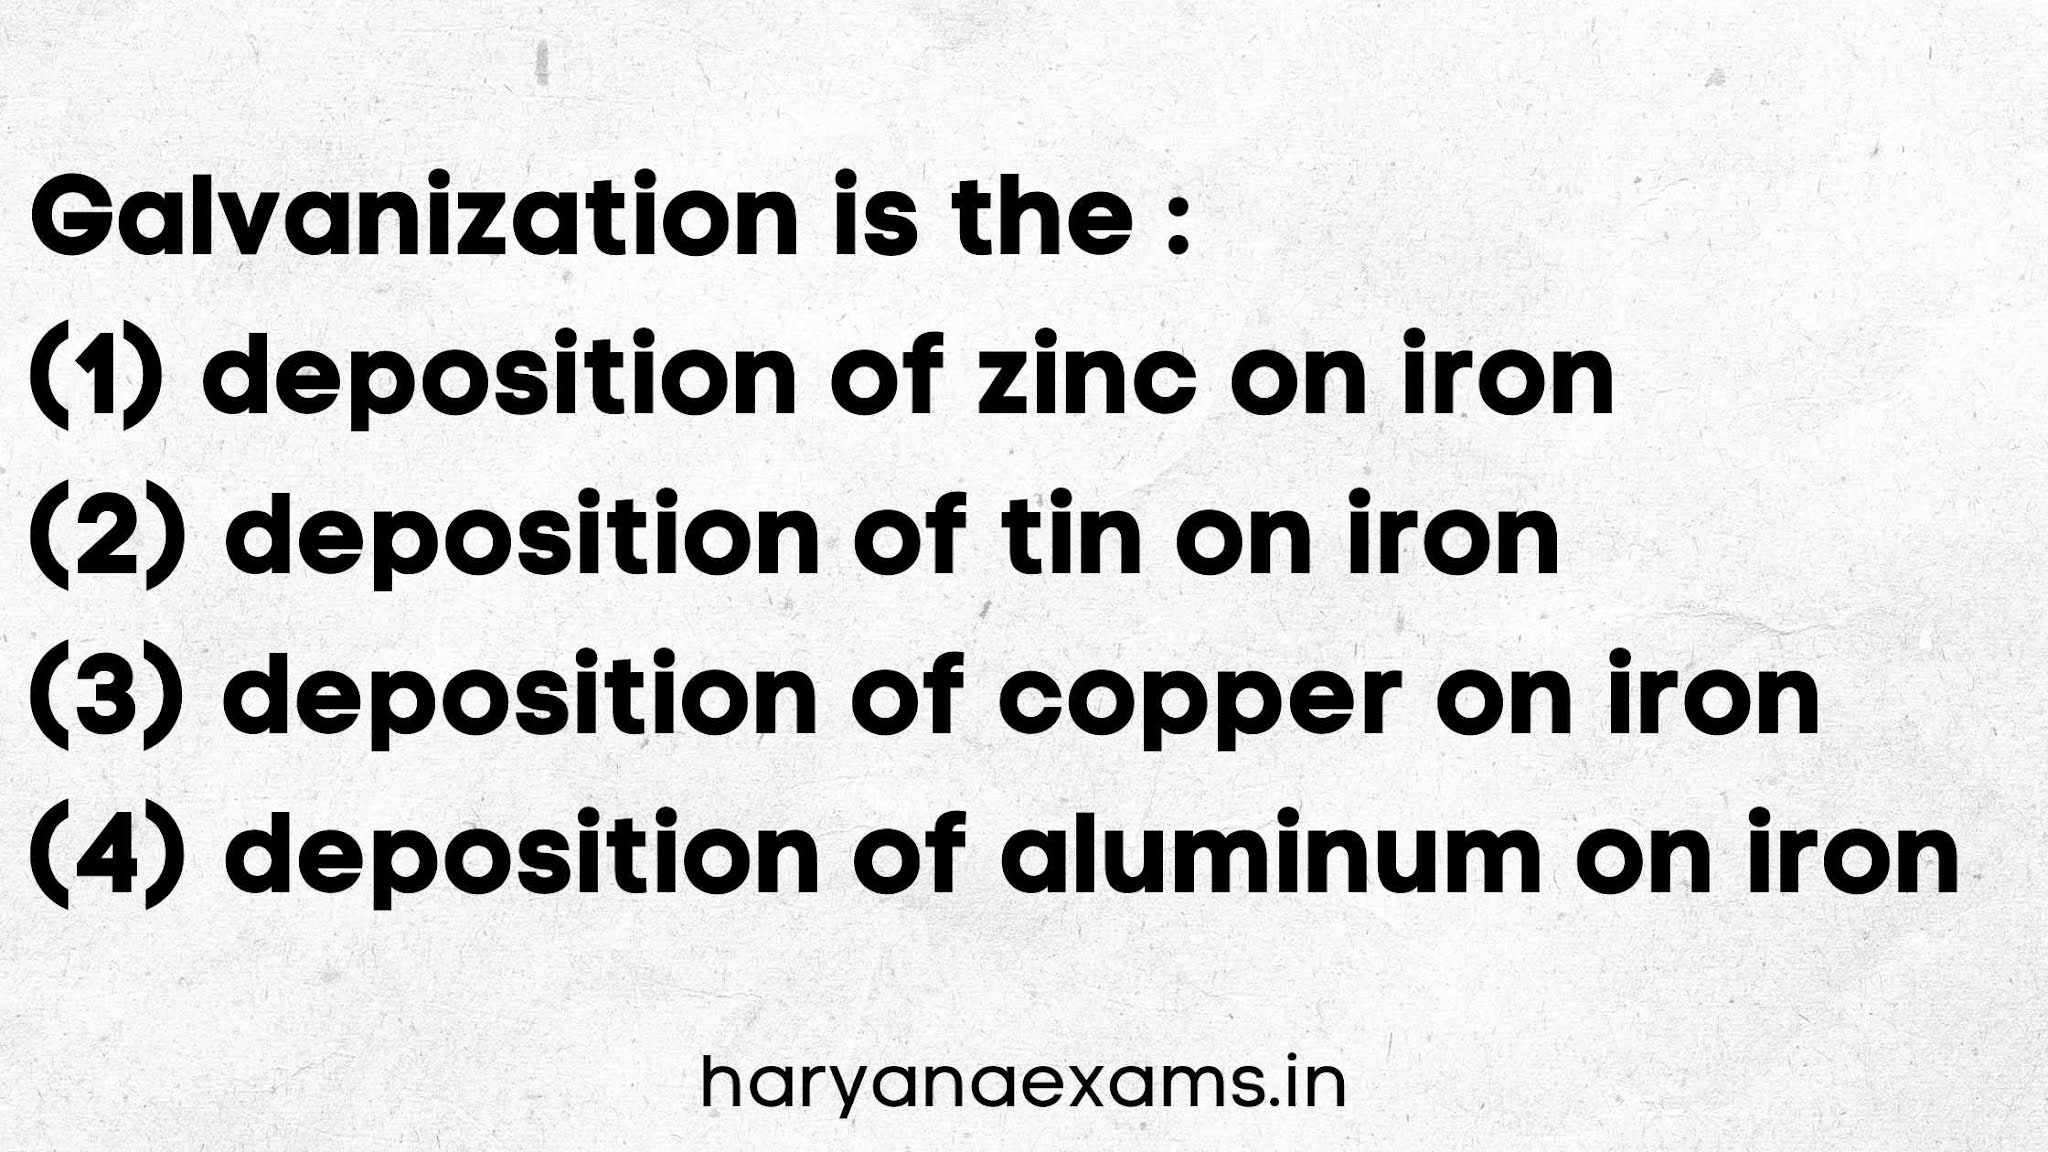 Galvanization is the :   (1) deposition of zinc on iron   (2) deposition of tin on iron   (3) deposition of copper on iron   (4) deposition of aluminum on iron